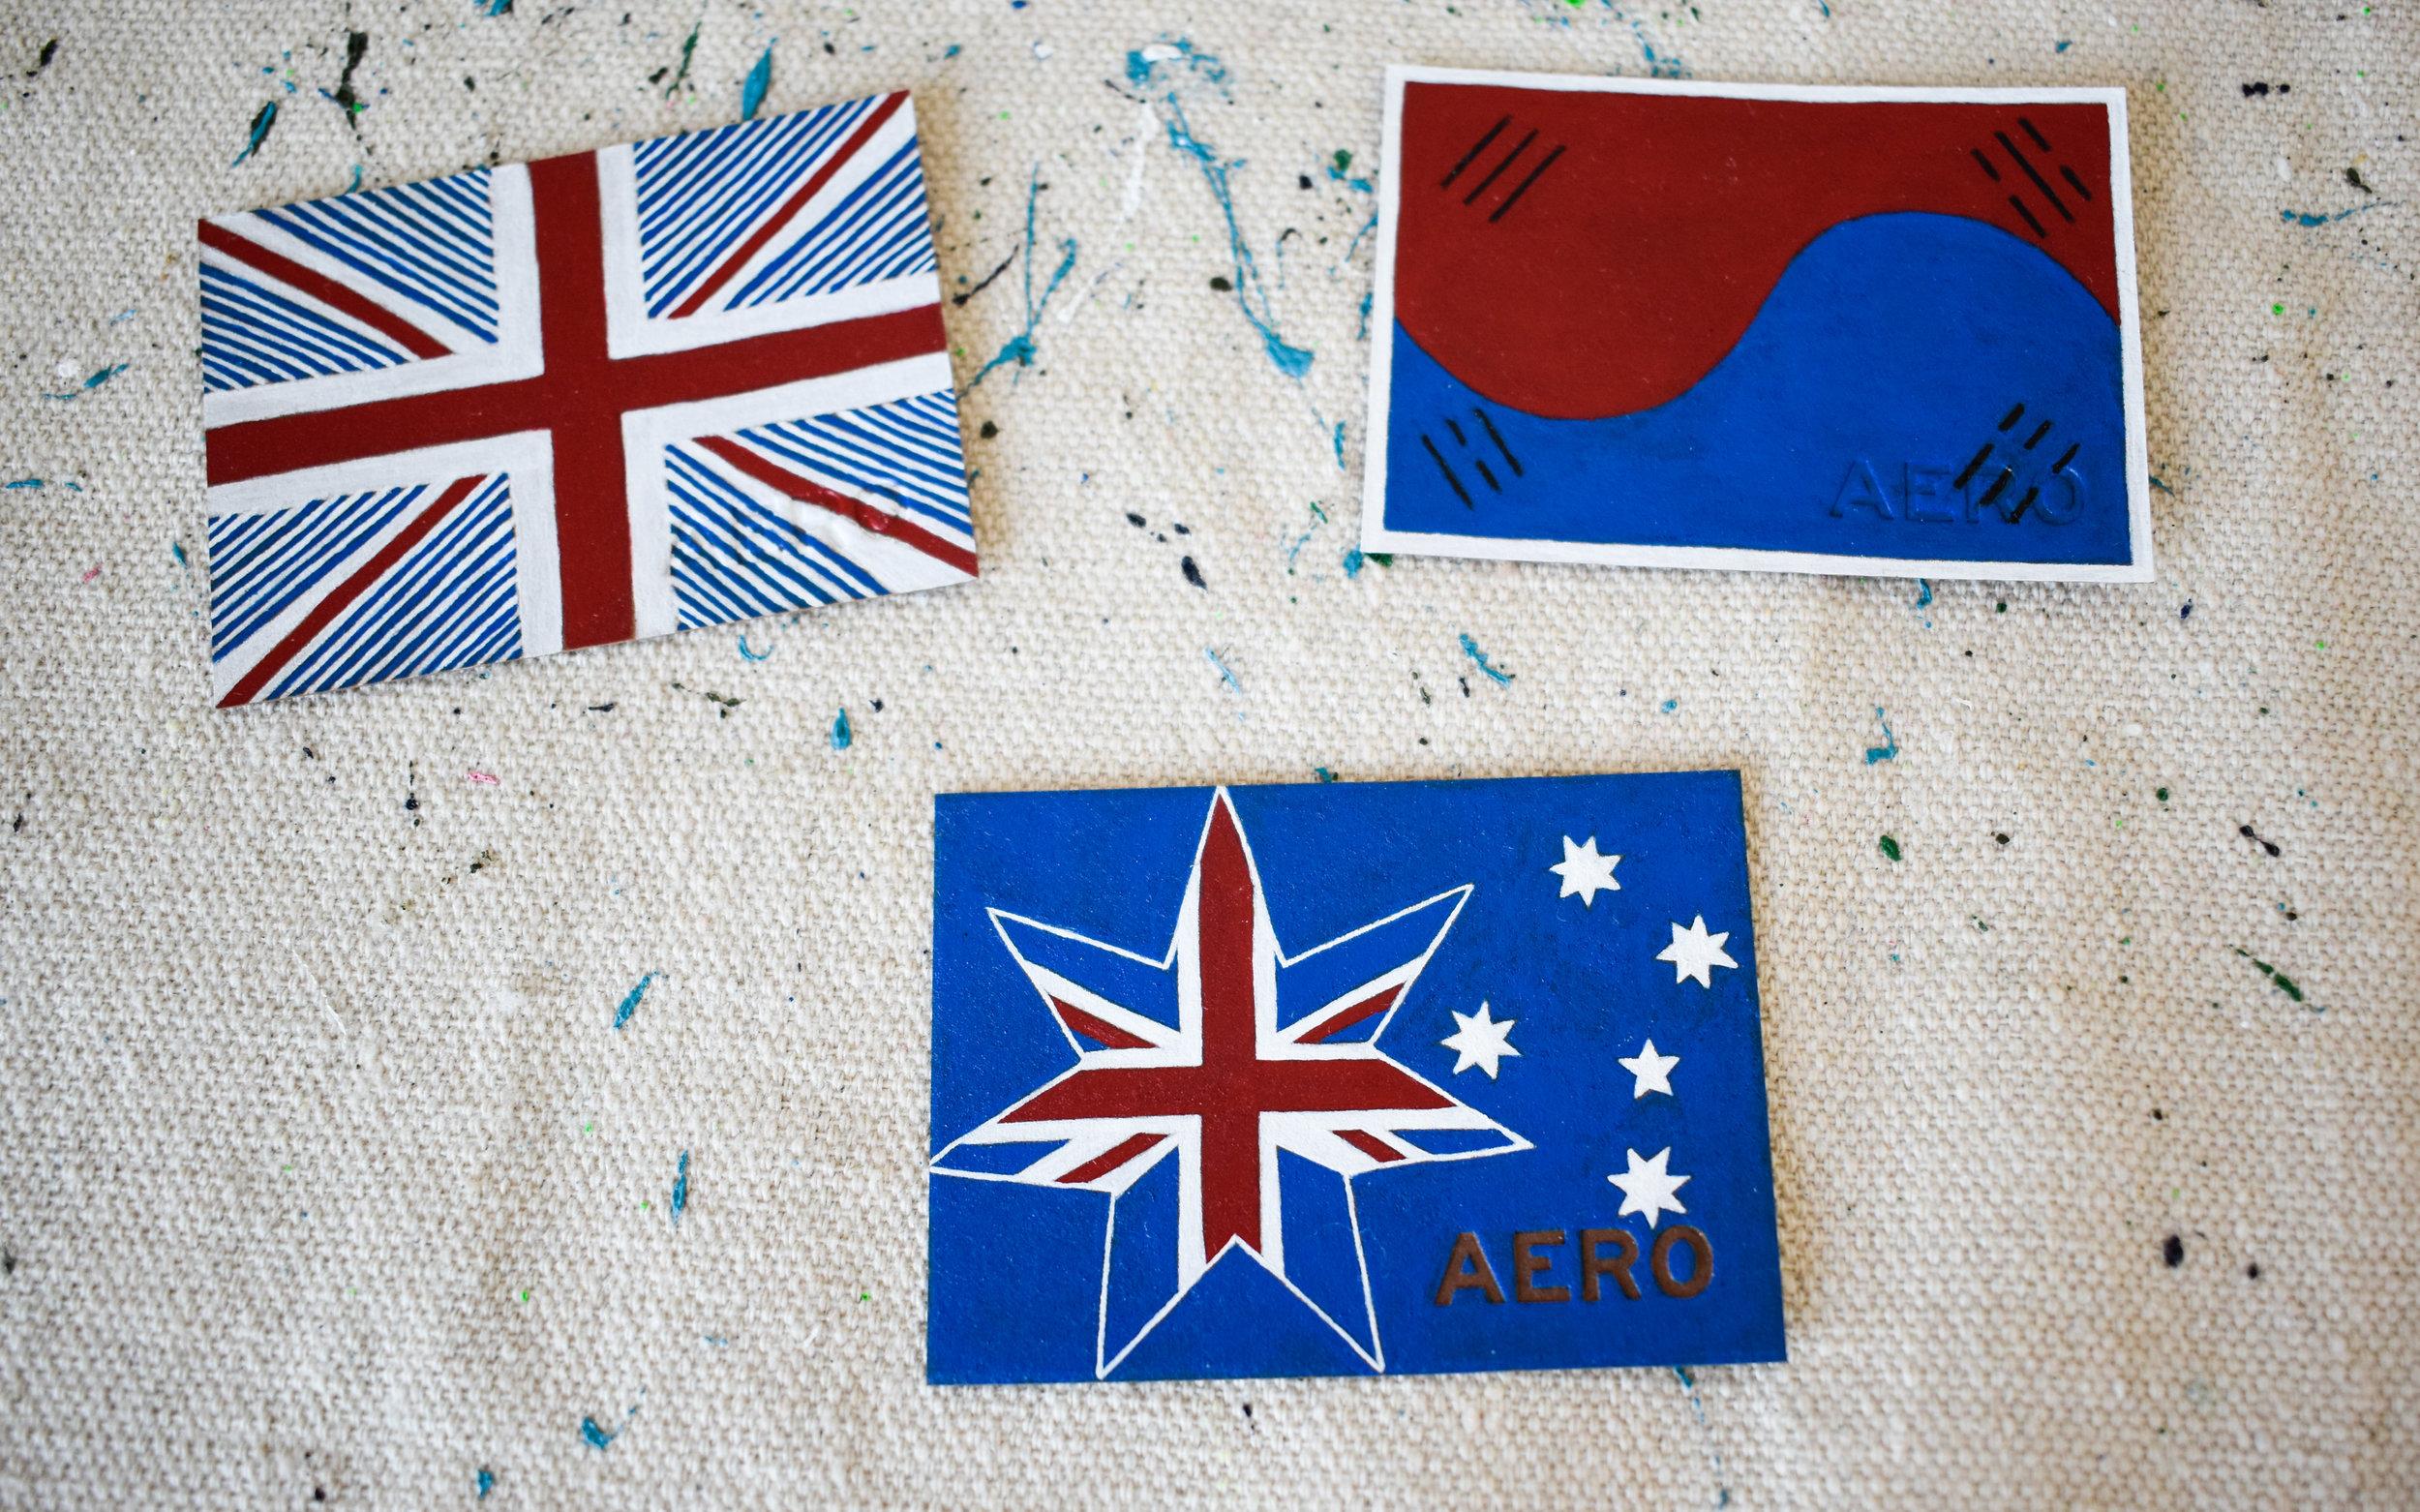 Who-leesa_x_AERO_banderas_4.jpg